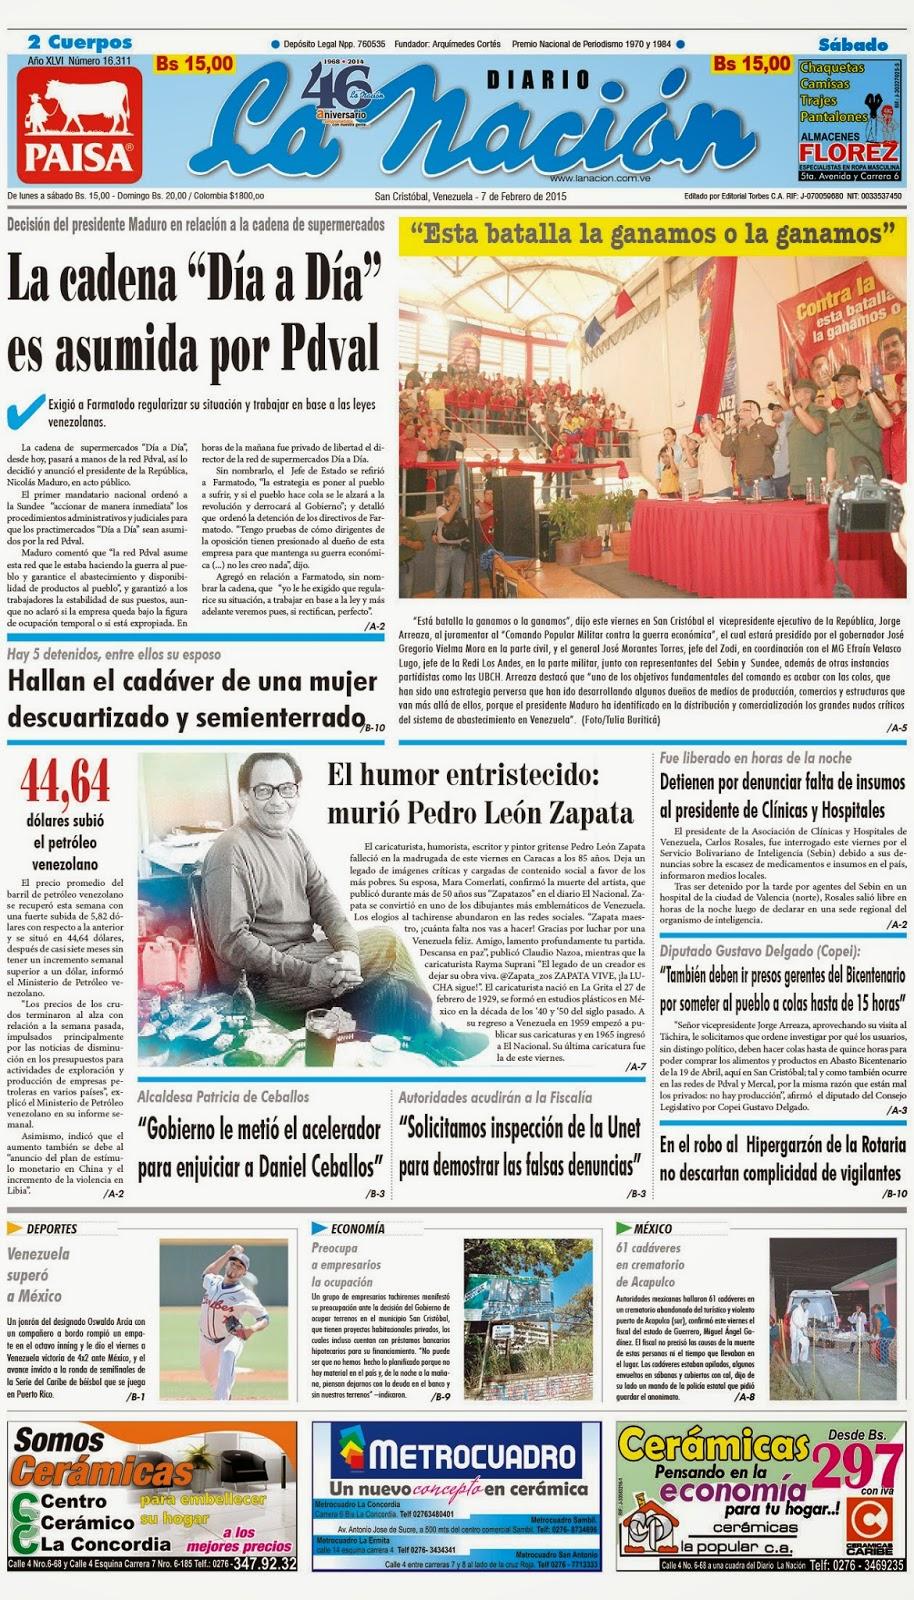 En Venezuela, PDVAL asume control de cadena privada de supermercados con 36 tiendas